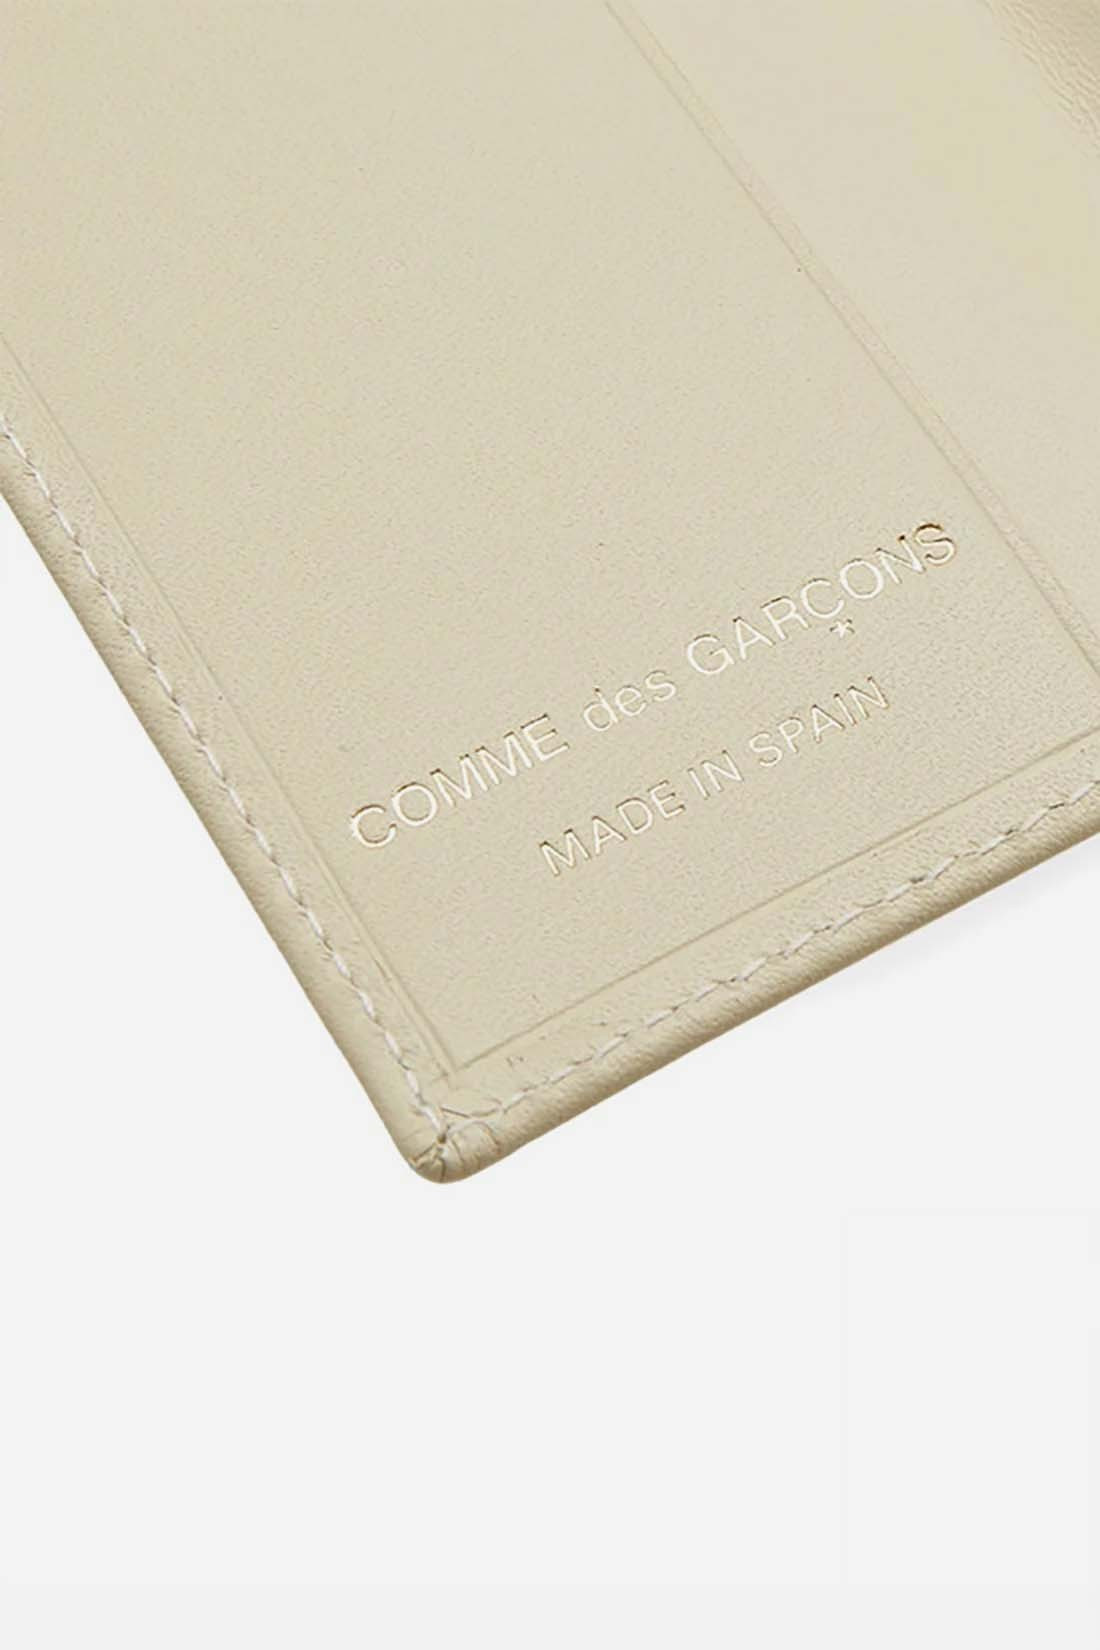 COMME DES GARÇONS WALLETS / Cdg leather wallet classic White